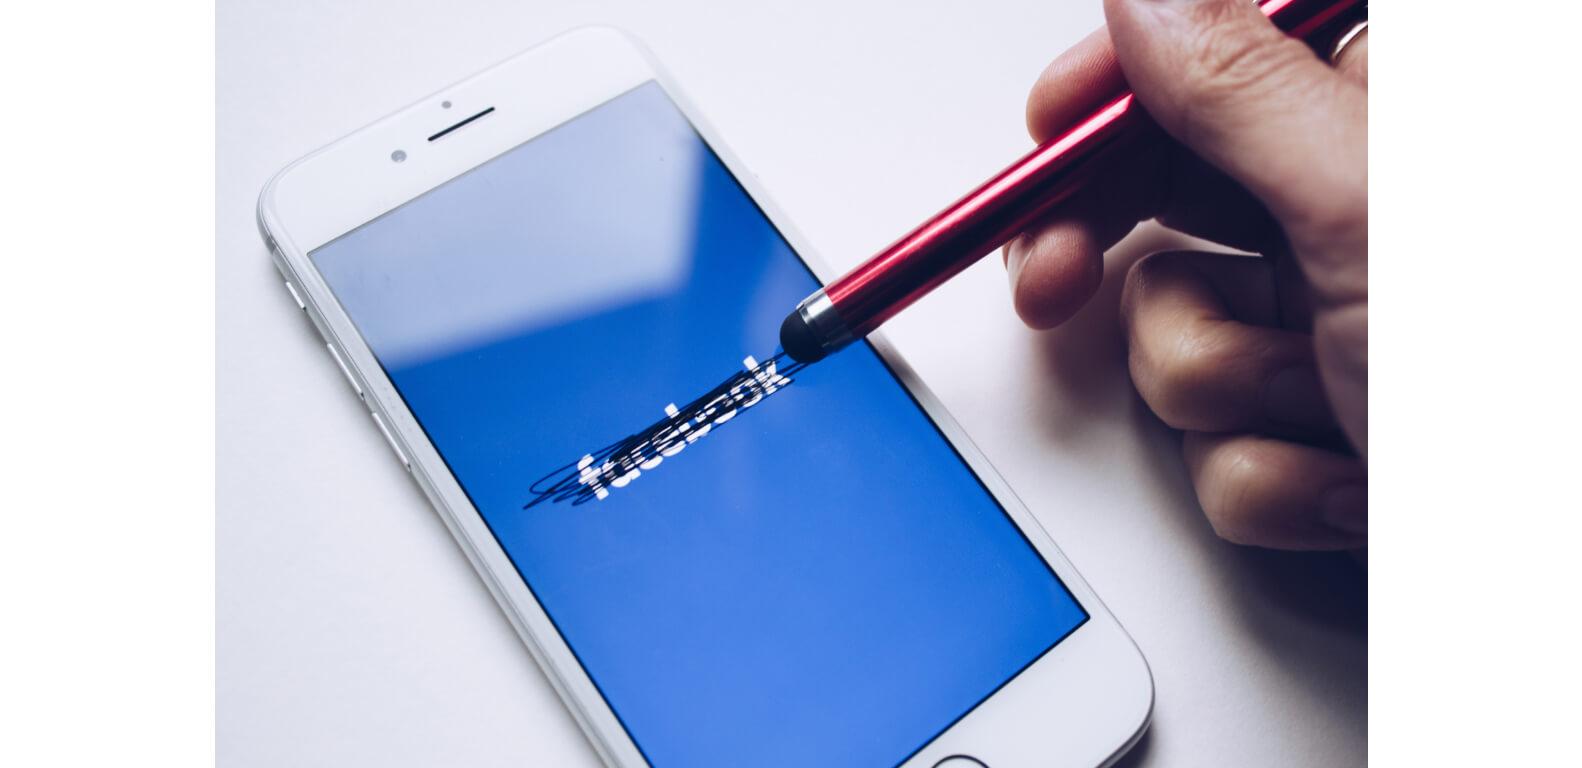 facebook databreach